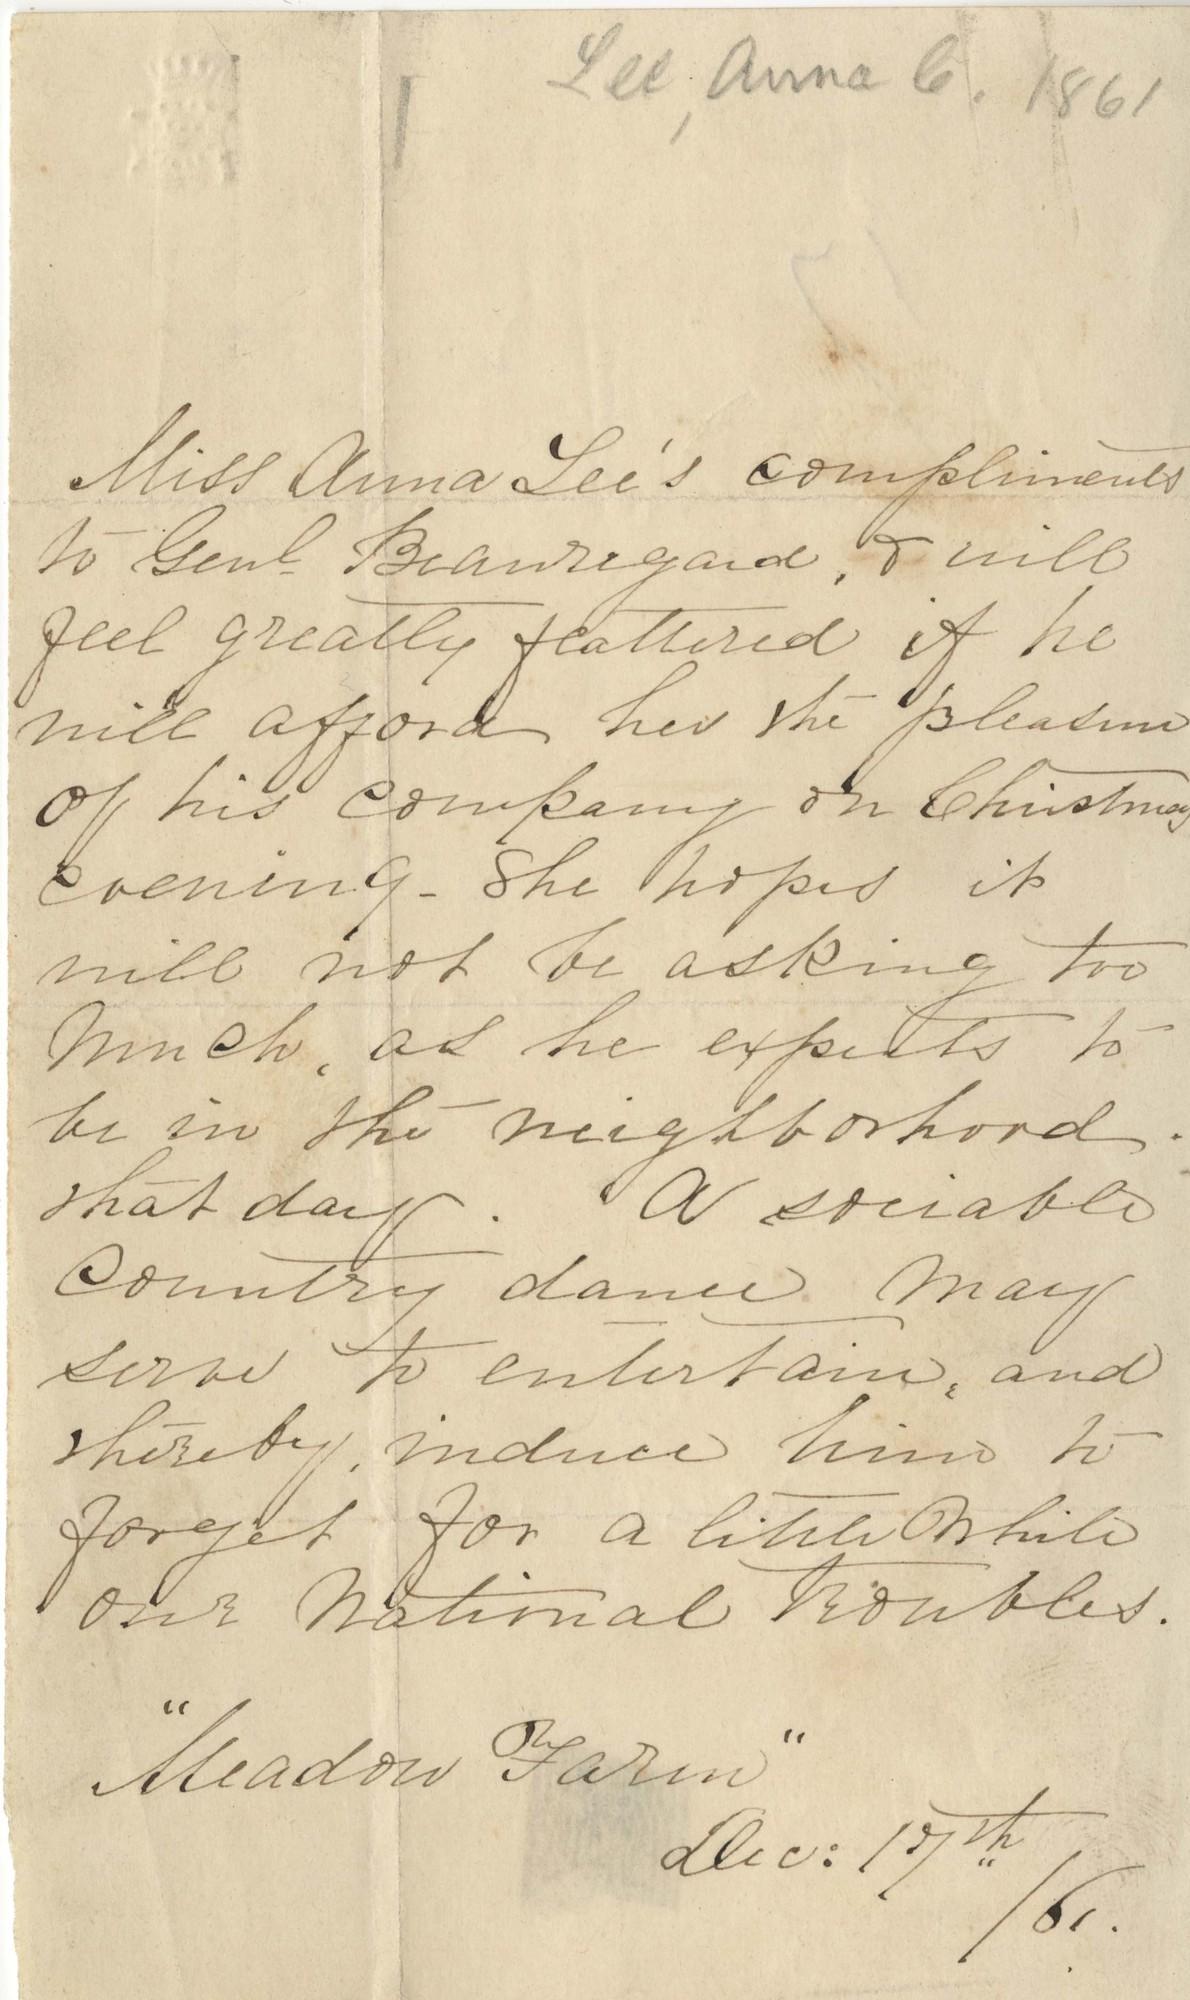 Ms2008-028_LeeAnna_Letter_1861_1217.jpg